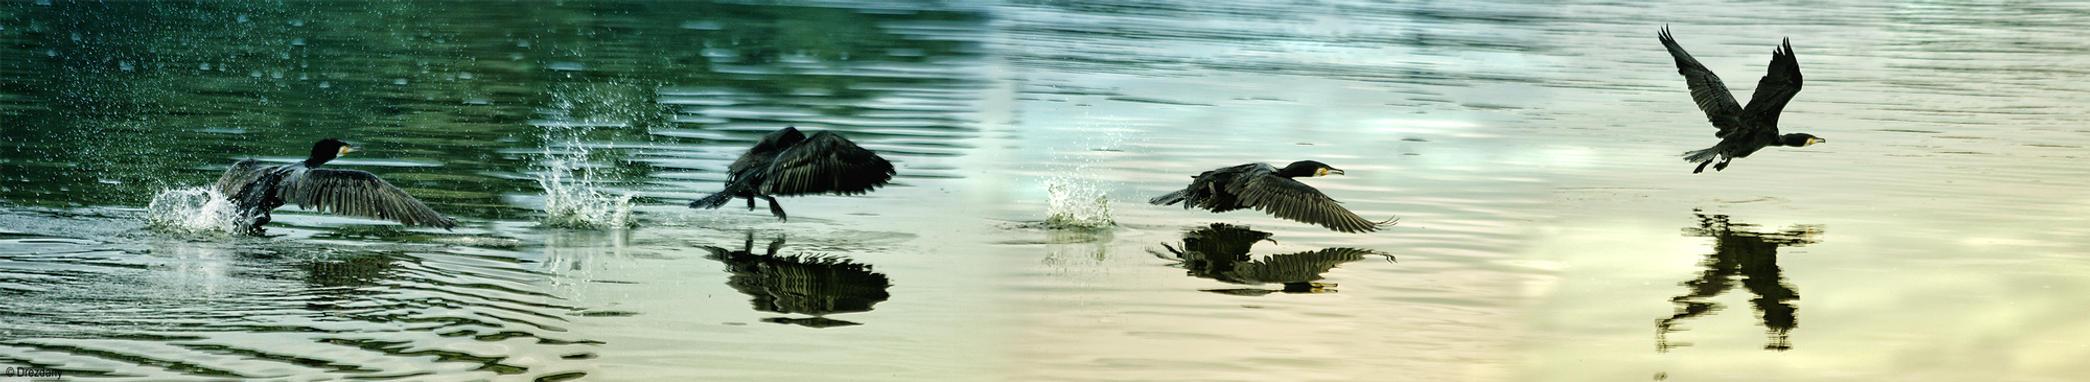 Great Cormorant in flight by Drezdany